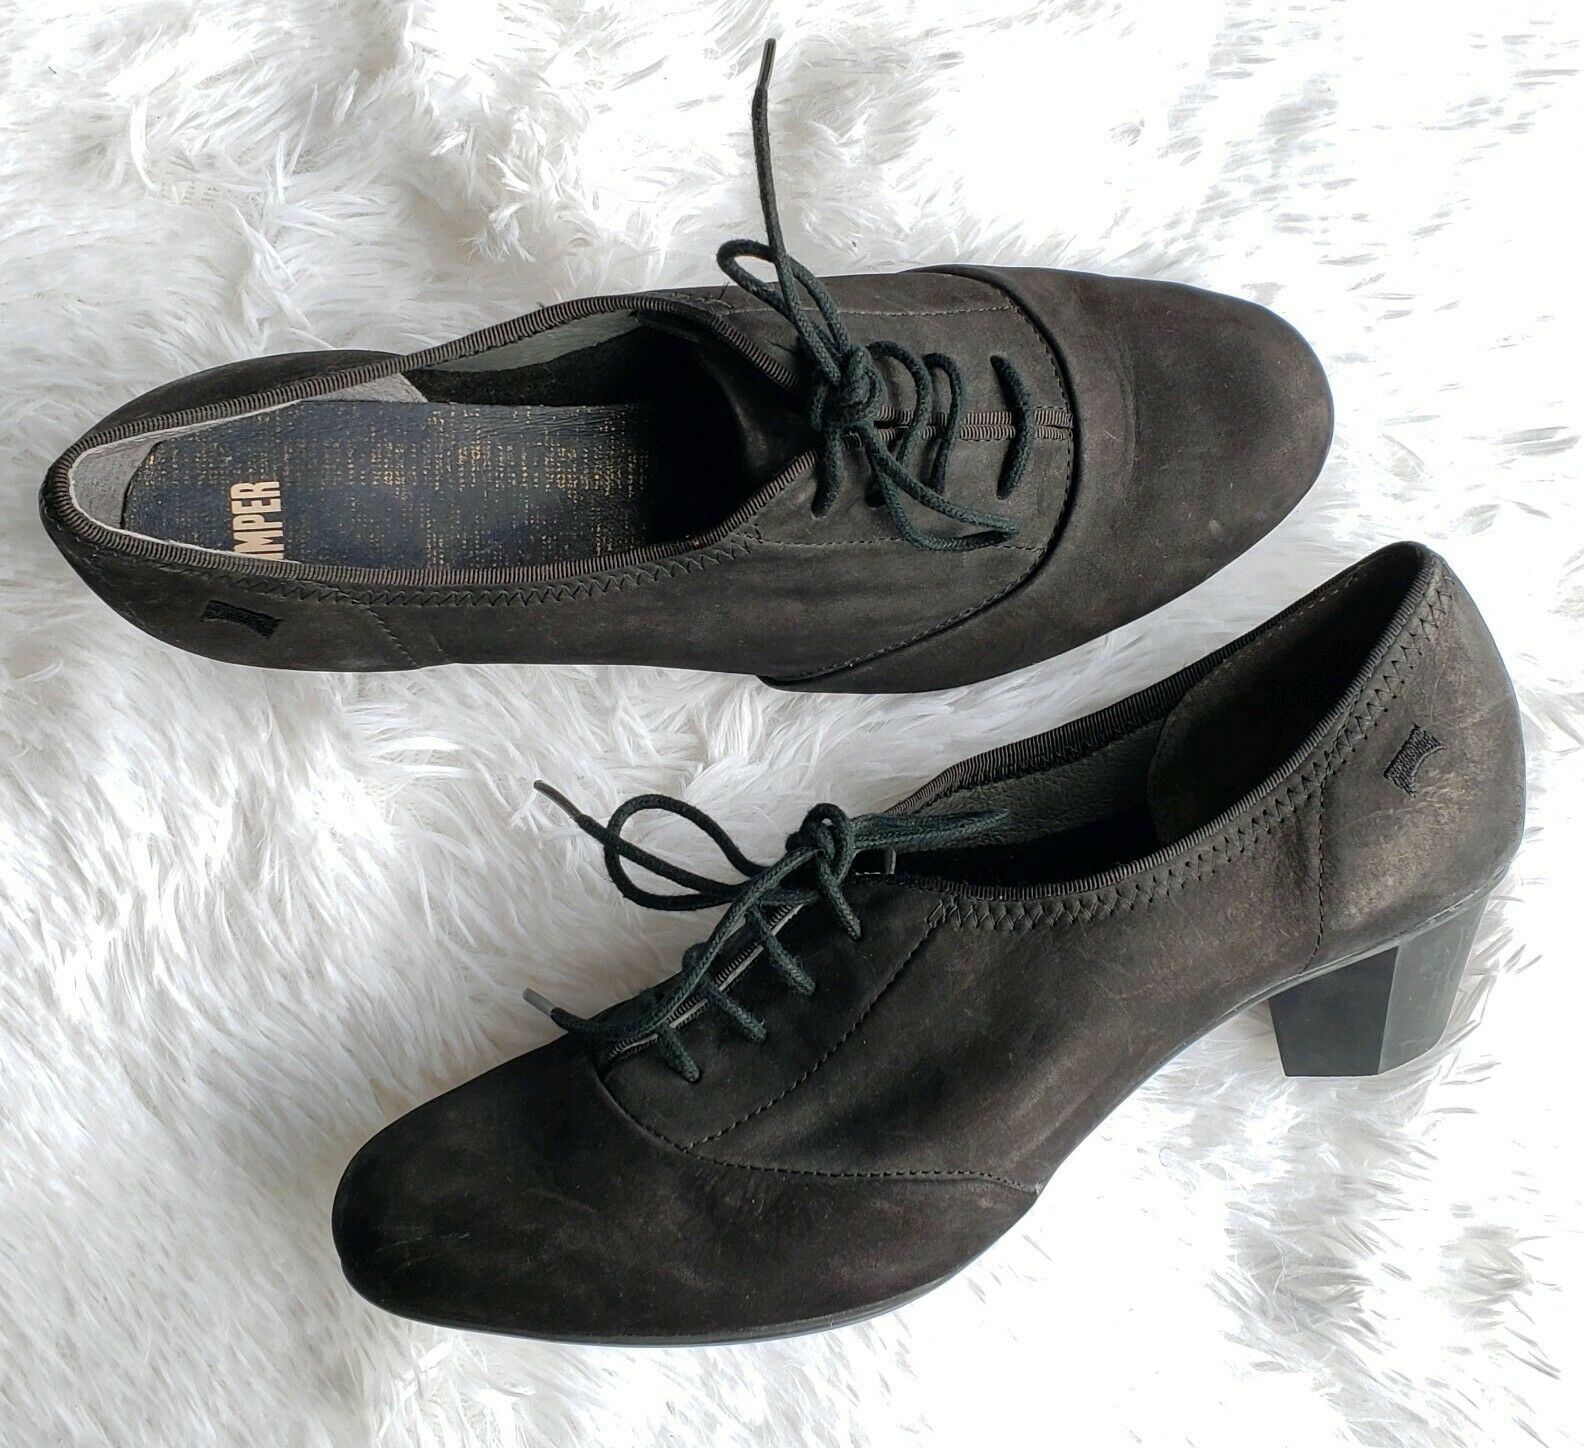 CAMPER Kim Black Nubuck Leather Oxford Pumps Low Heel Size 40